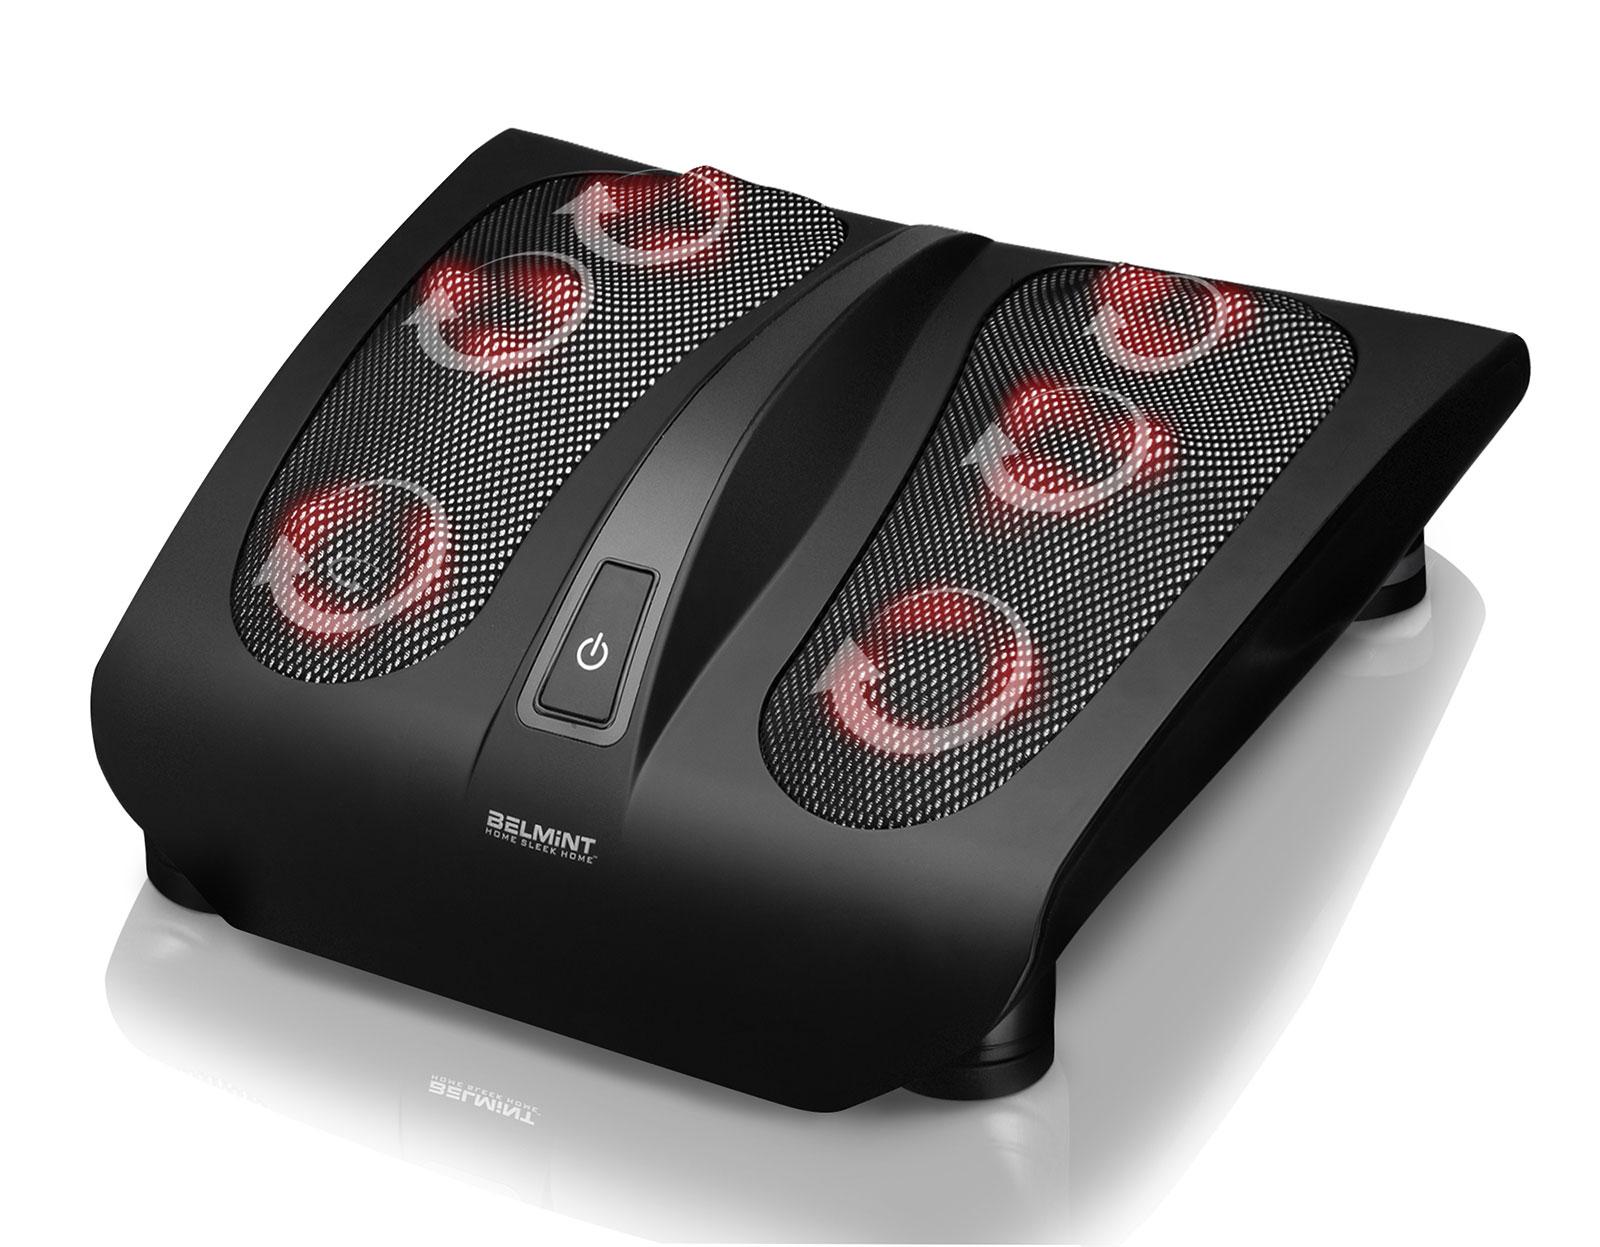 Spas, Baths & Supplies Massagers Foot Massager Deep Kneading Shiatsu Therapy Massage With Built In Heat Hot